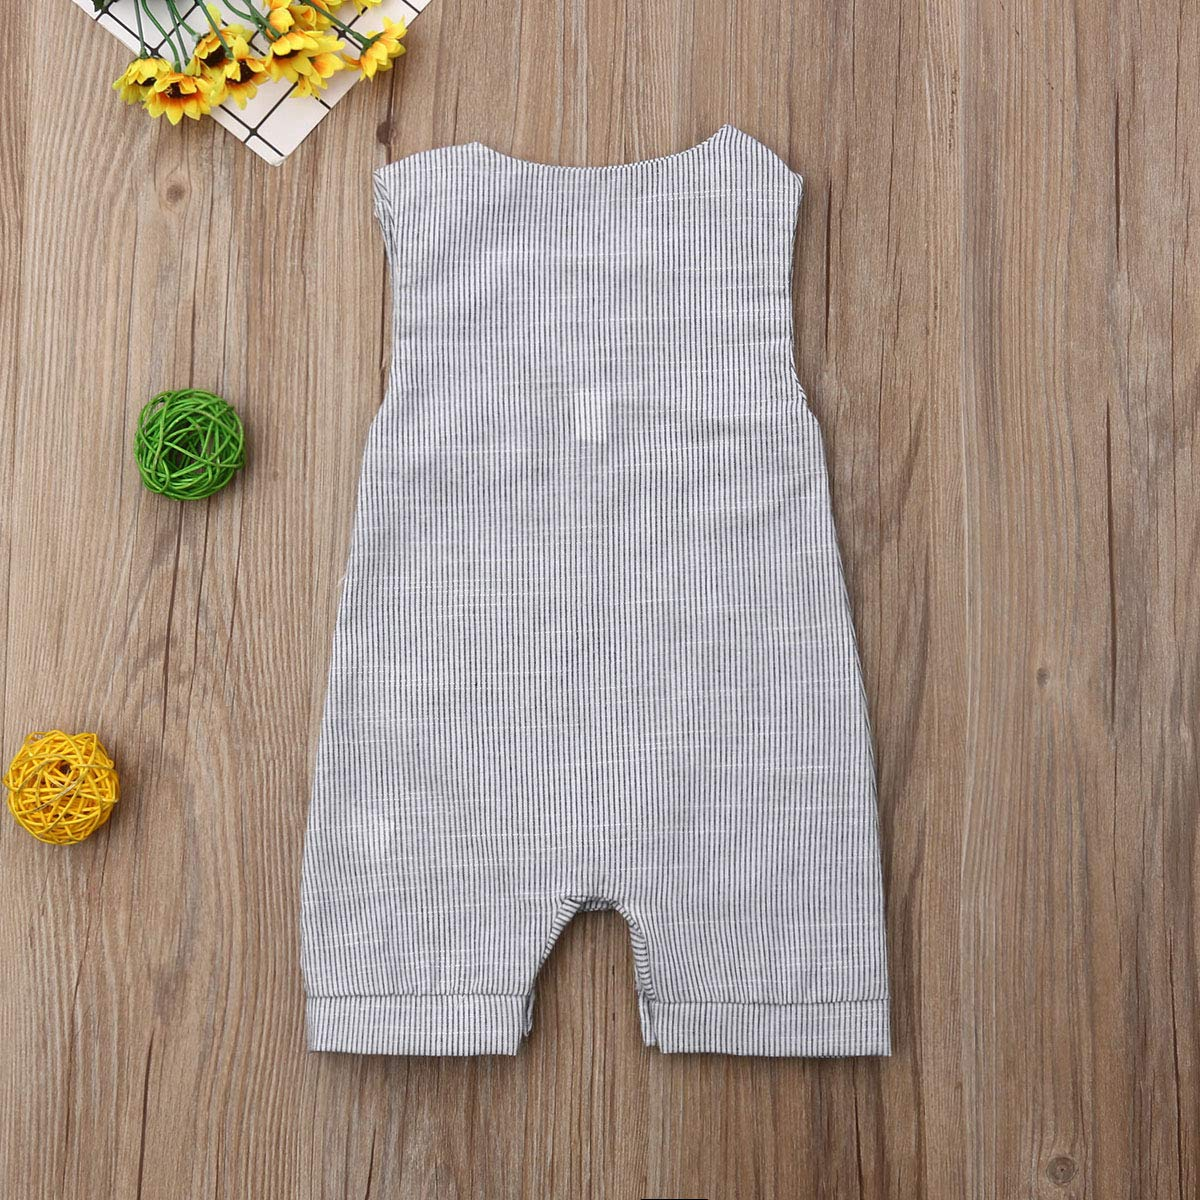 0-18M MSDMSASD Newborn Infant Baby Boy Romper Striped Sleeveless Clothes Jumpsuit with Pocket